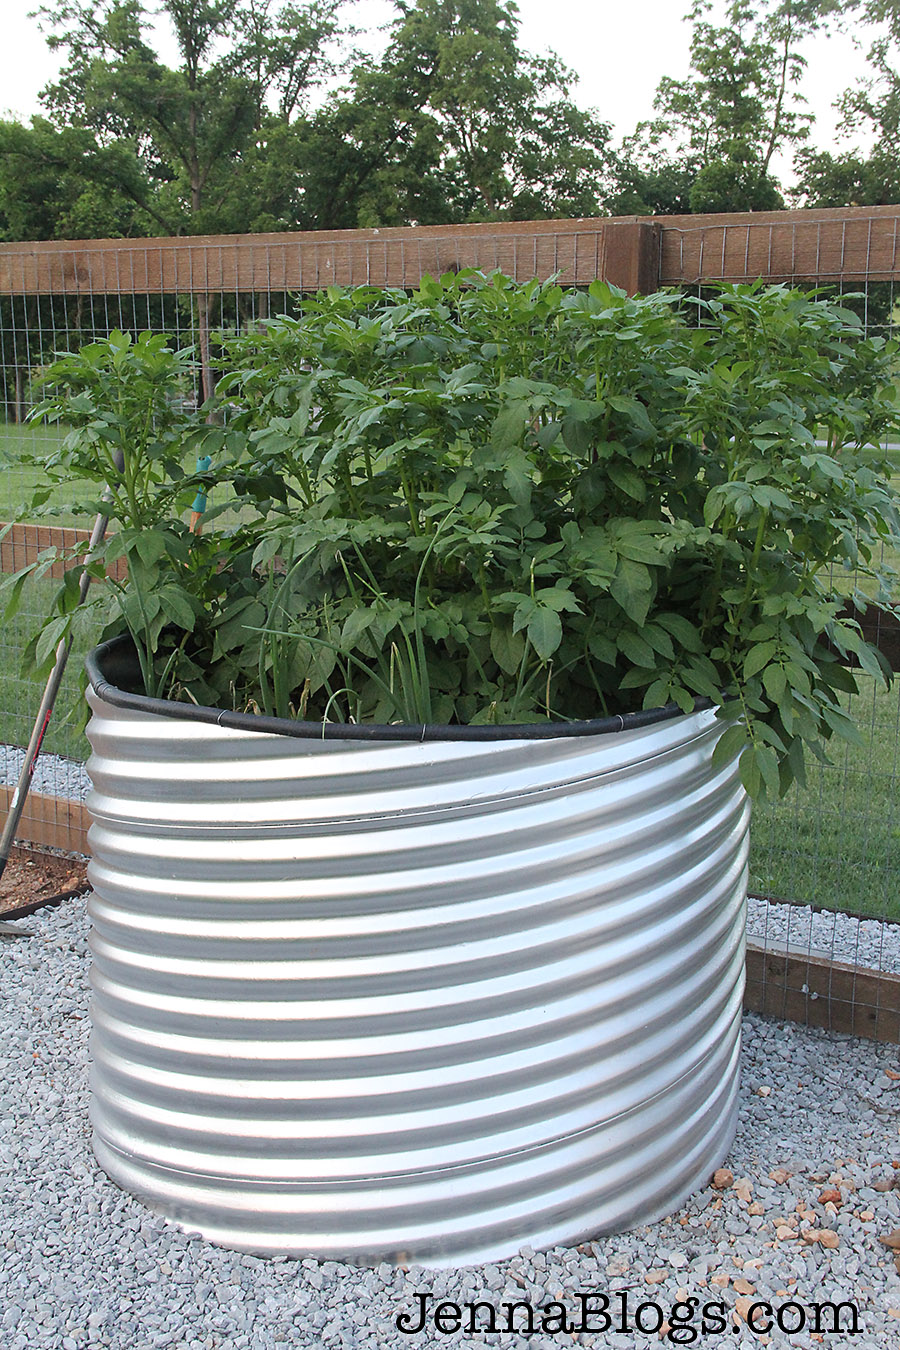 Jenna Blogs How To Make A Culvert Garden Planter